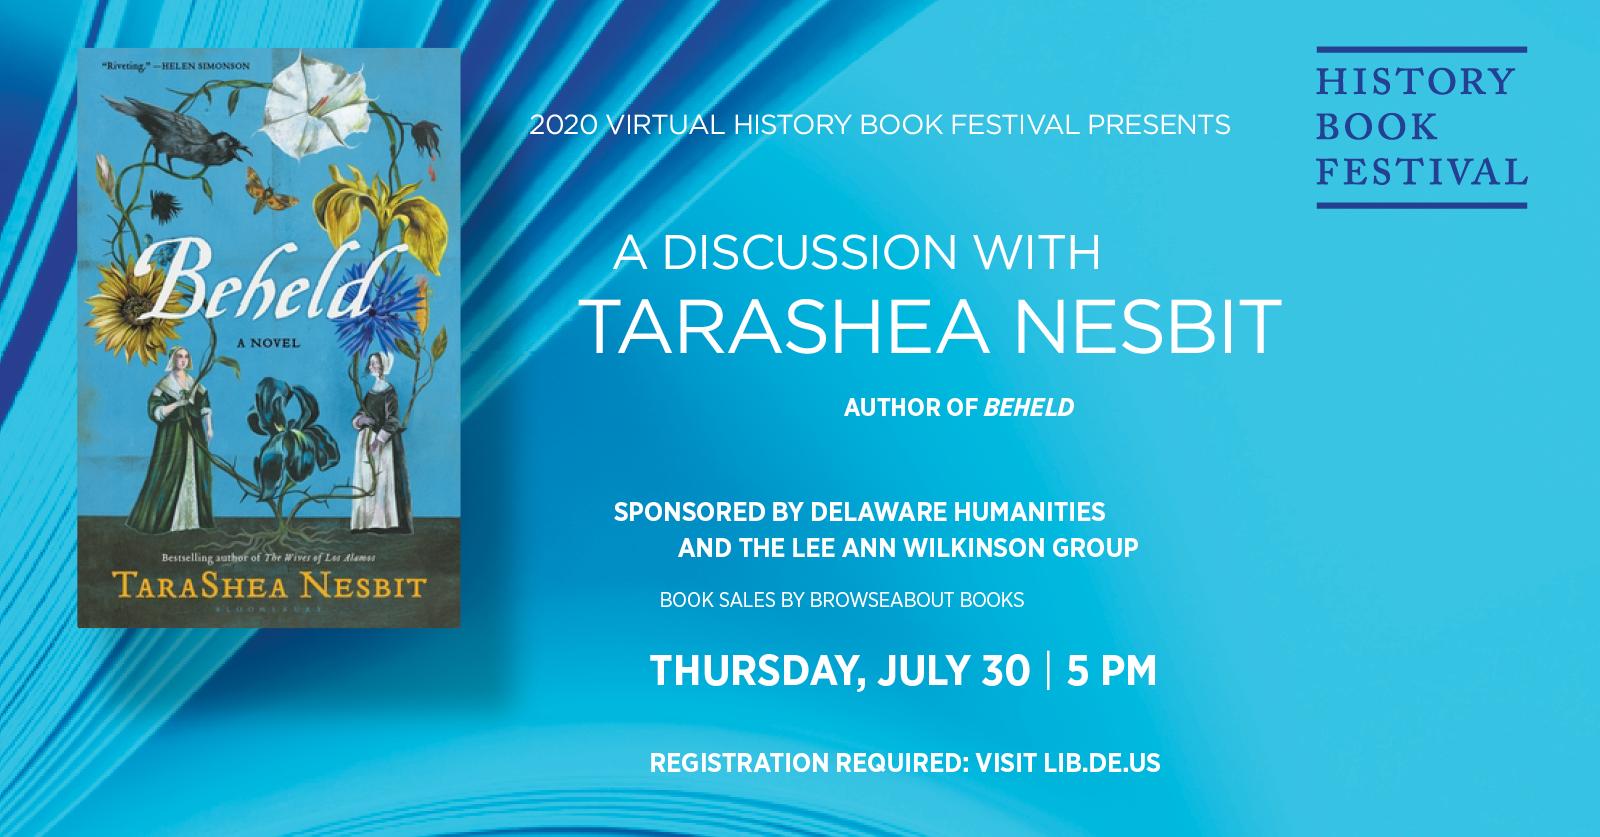 History Book Festival presents TaraShea Nesbit | Beheld